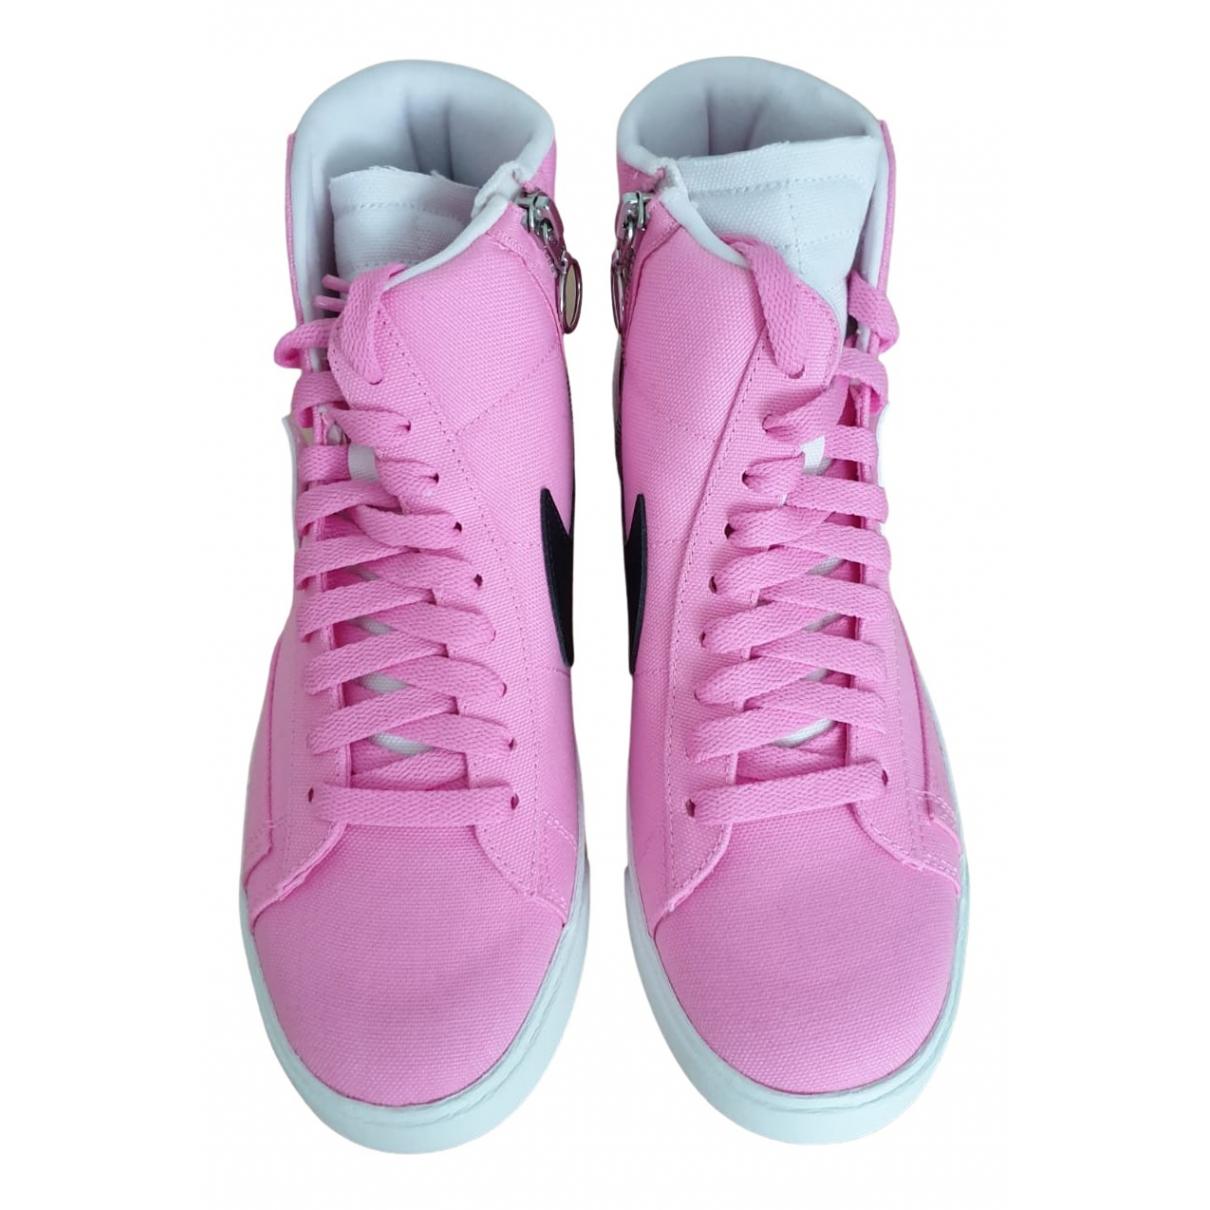 Nike - Baskets Blazer pour femme en toile - rose